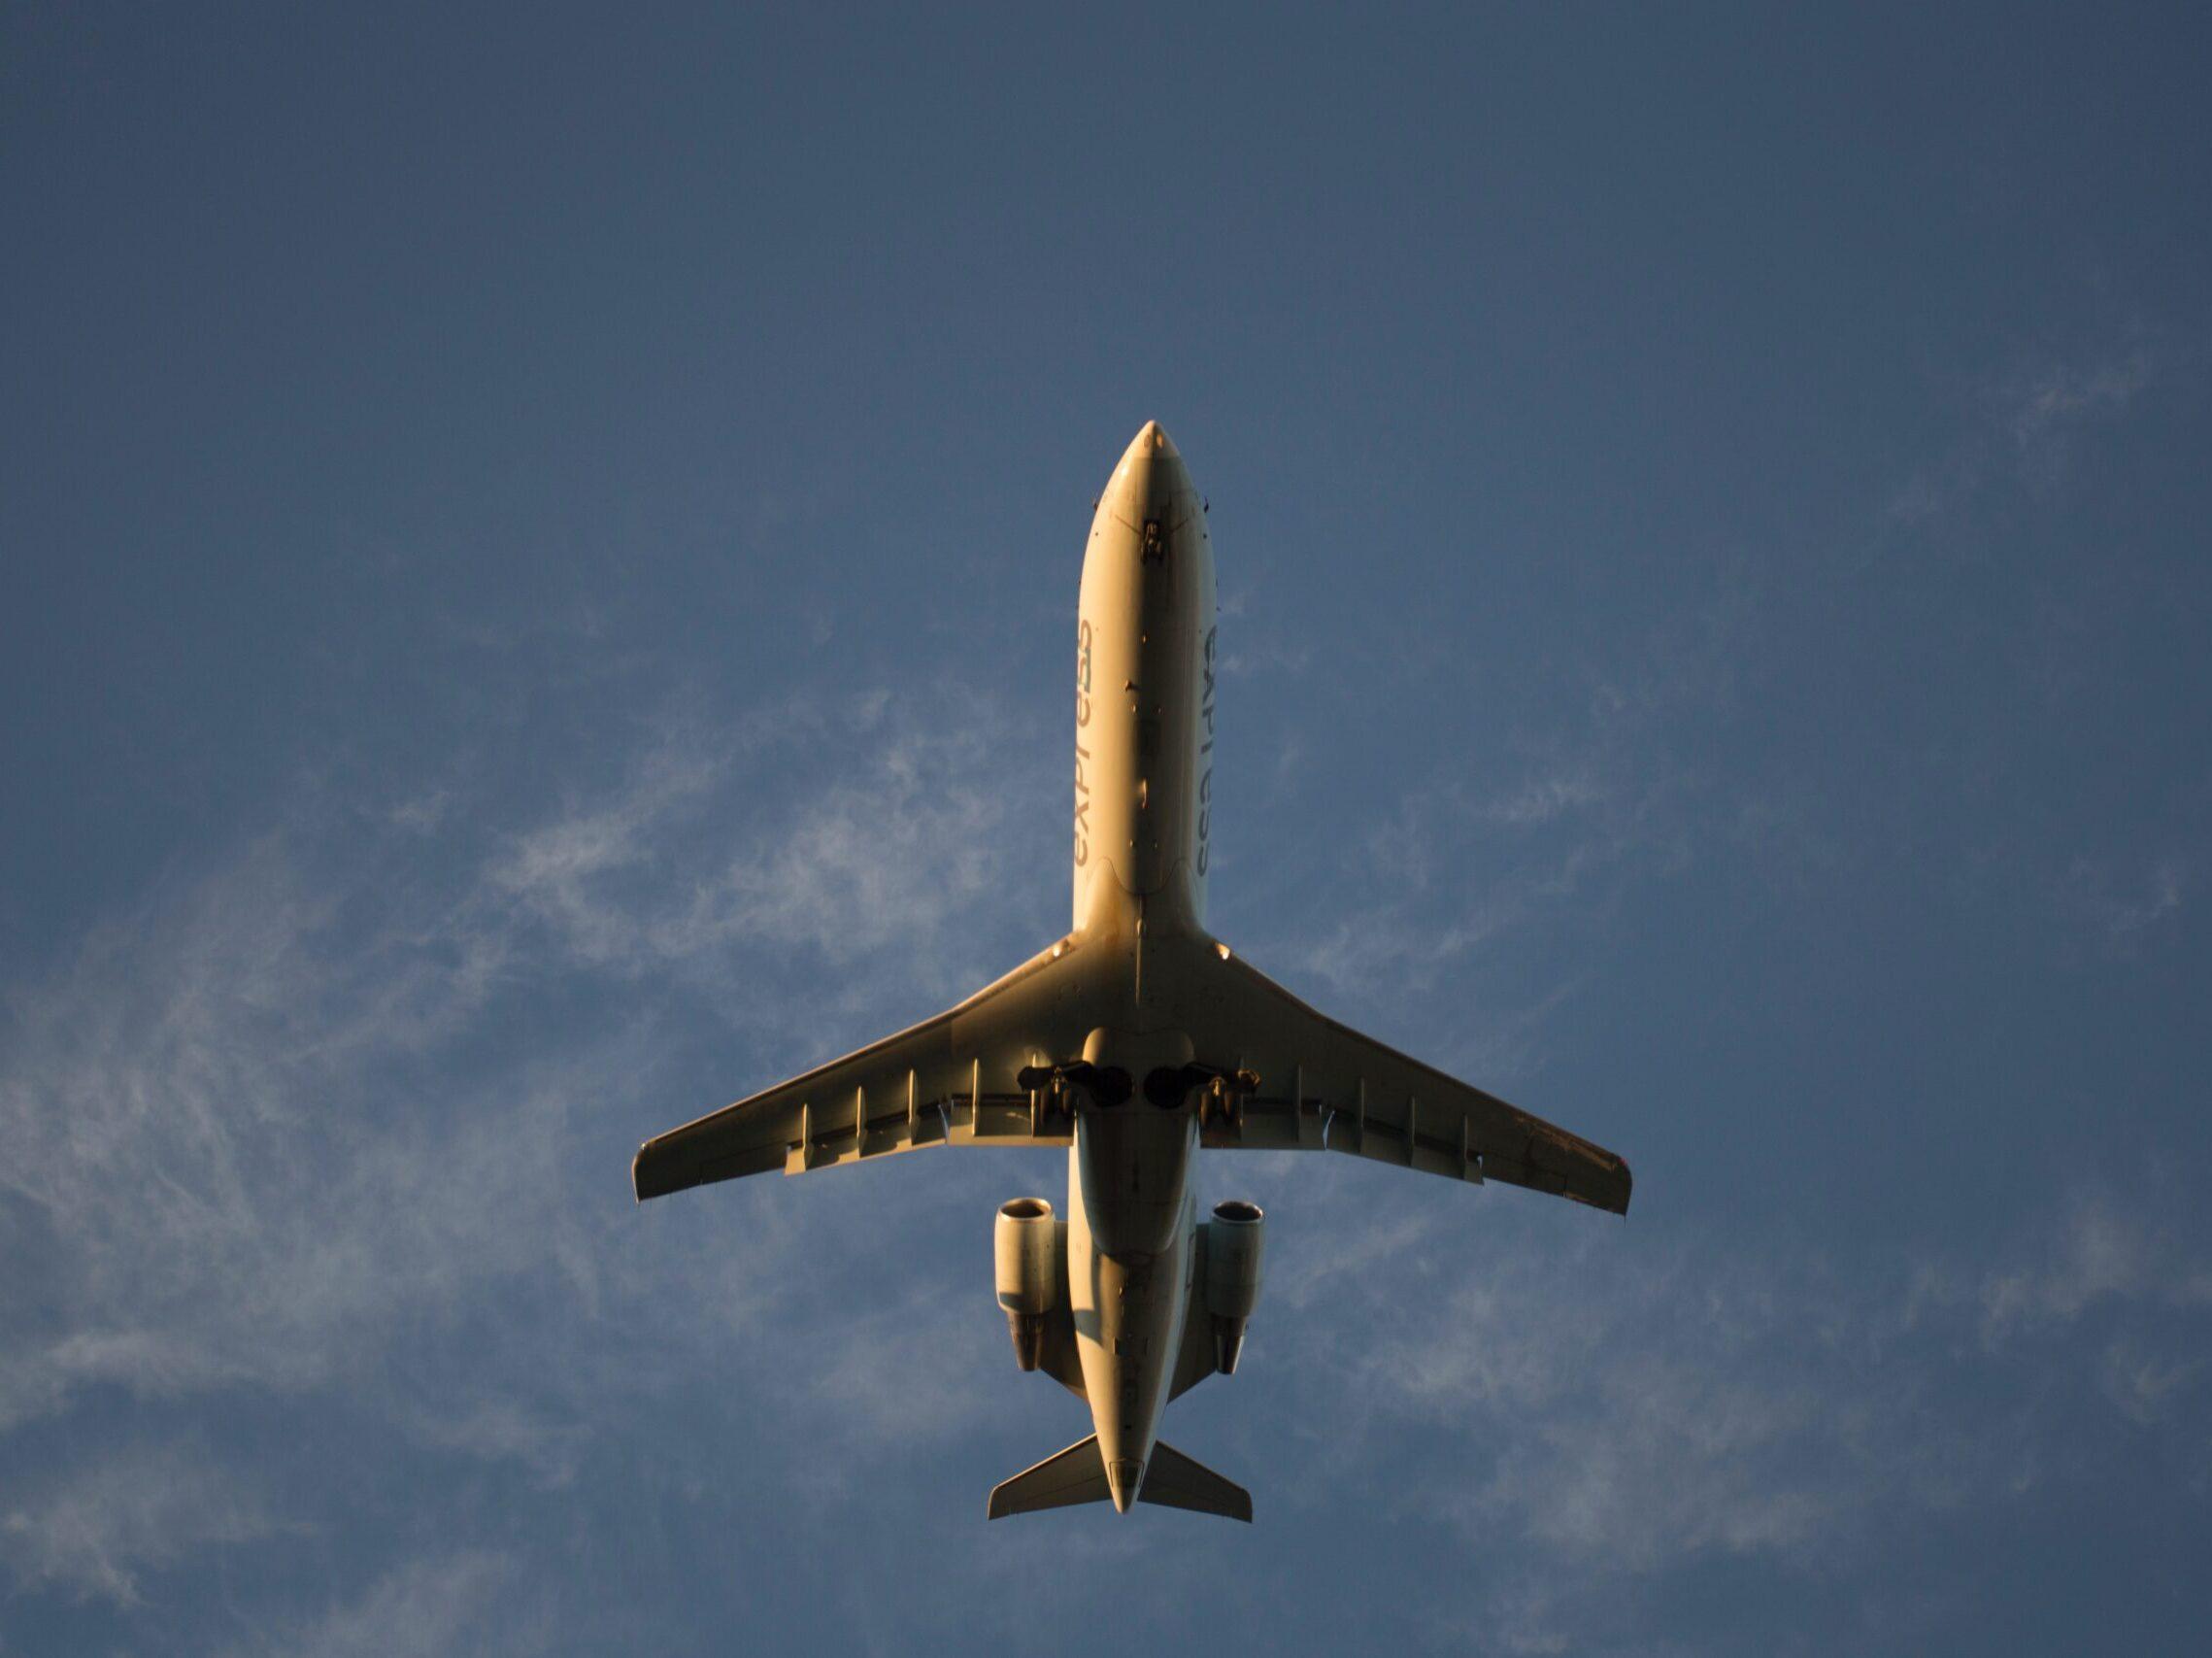 brown airplane